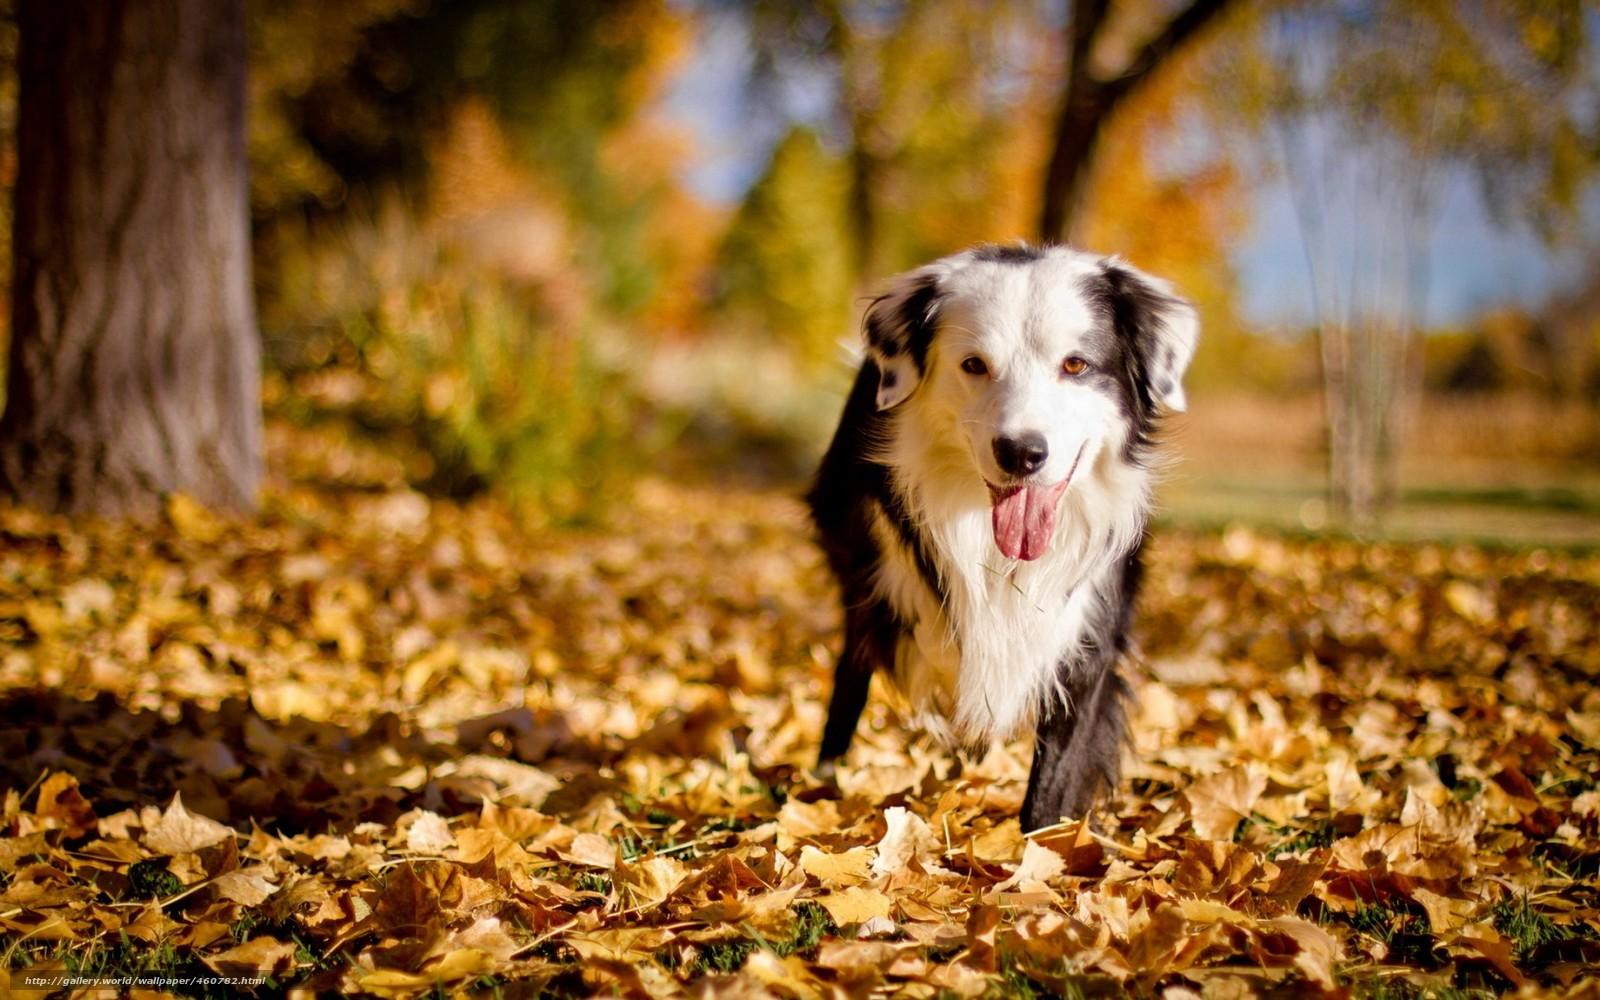 Download wallpaper dog friend autumn desktop wallpaper in 1600x1000